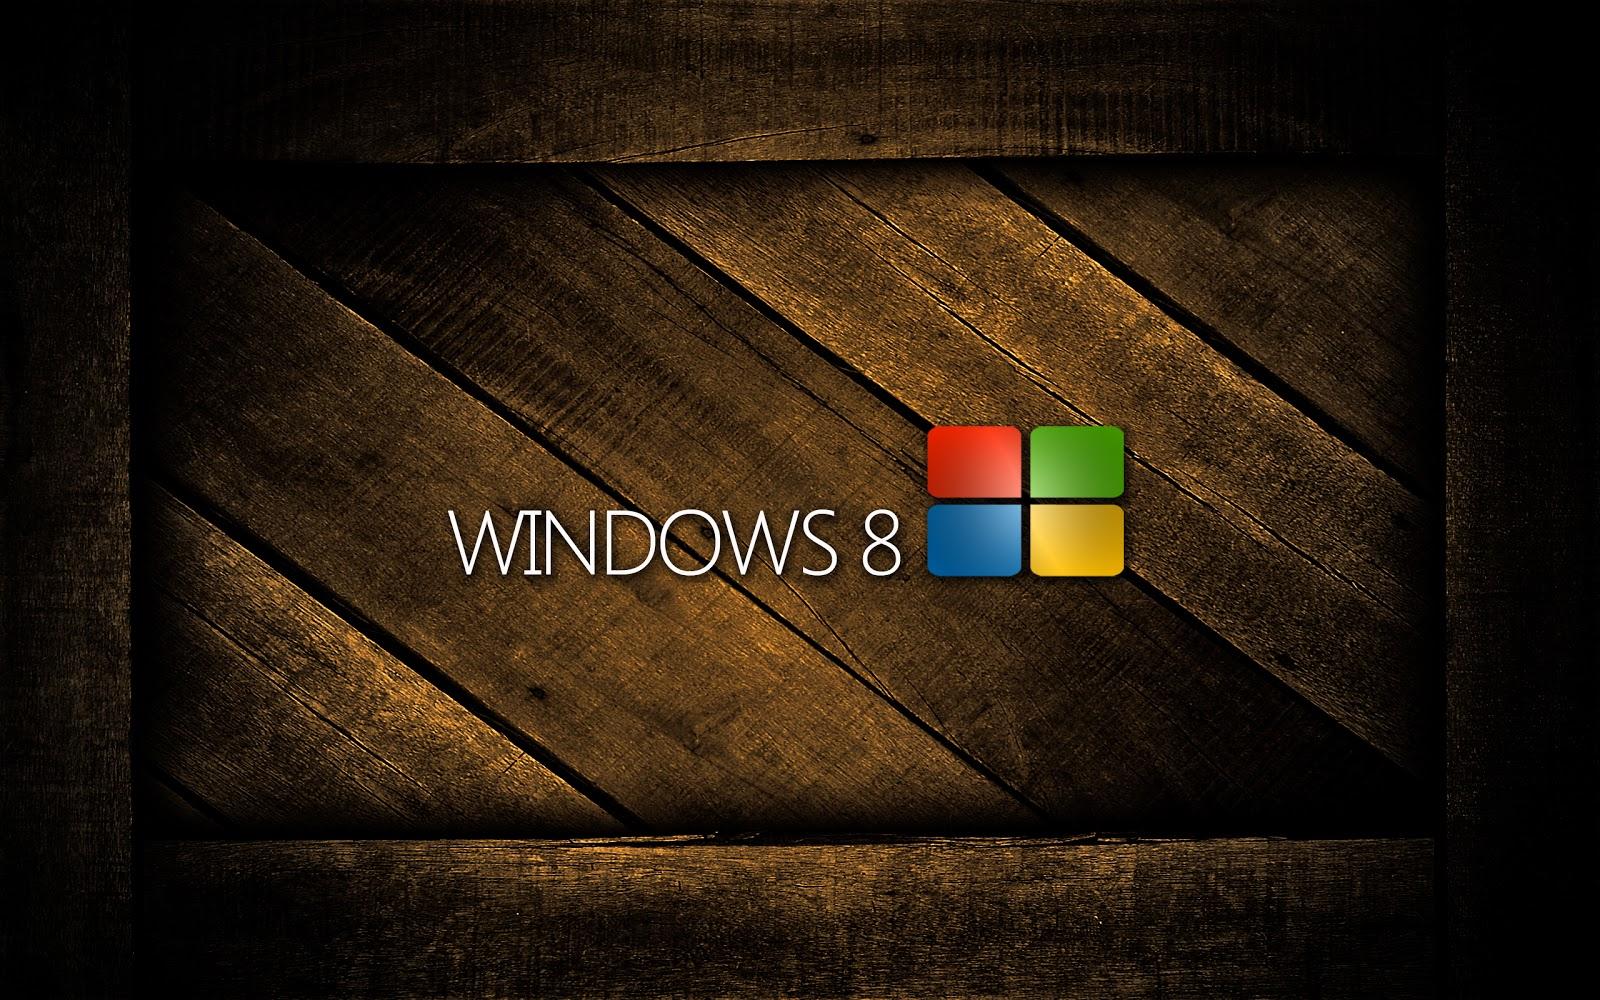 Windows 8 Wooden Hd Wallpaper Tabb Wallpapers